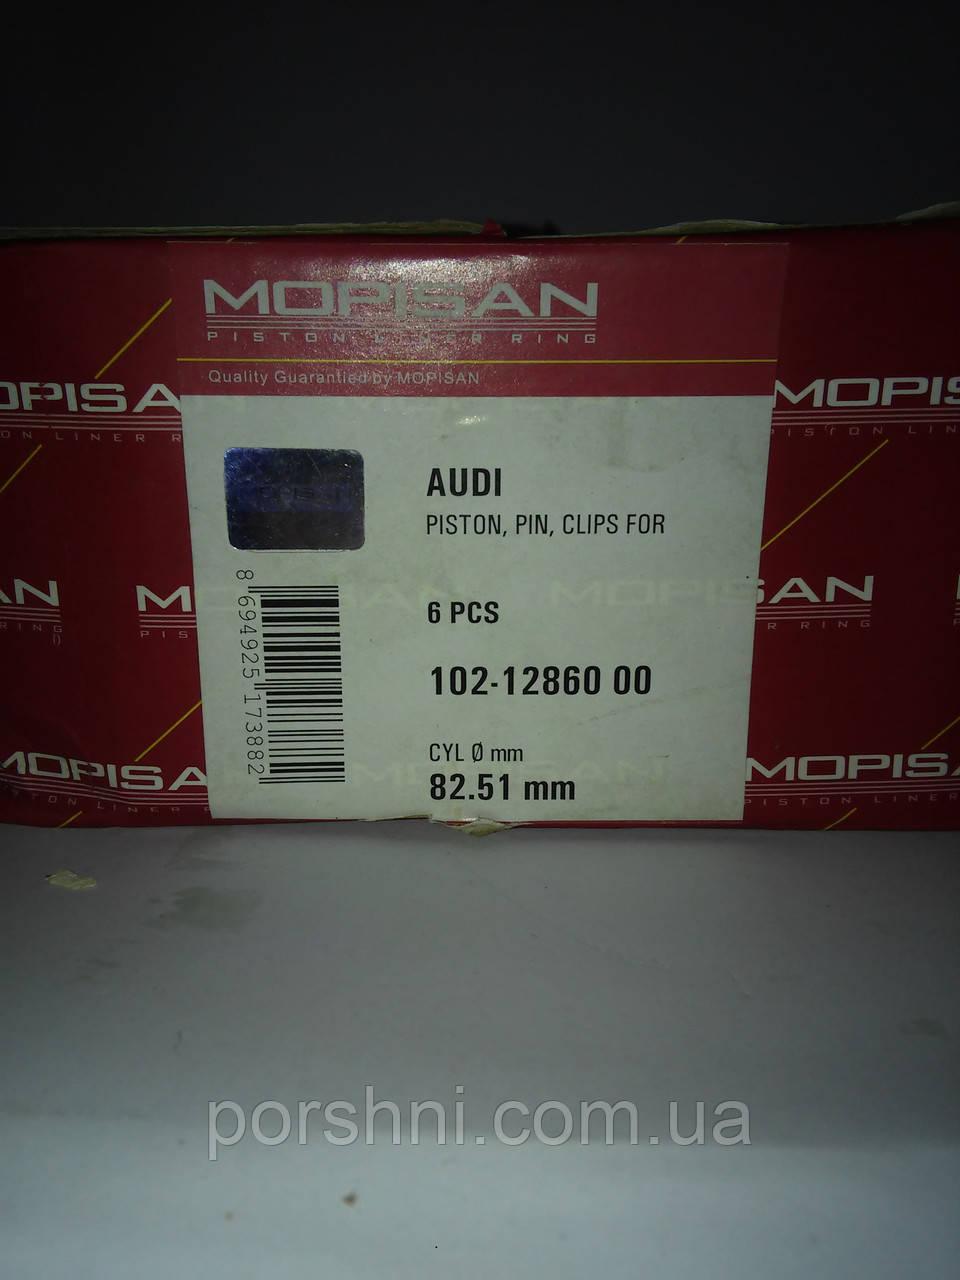 Поршни  AUDI  2.8  ( 1.2 х 1.5 х 2 )  диам 82.5 мотор AAA